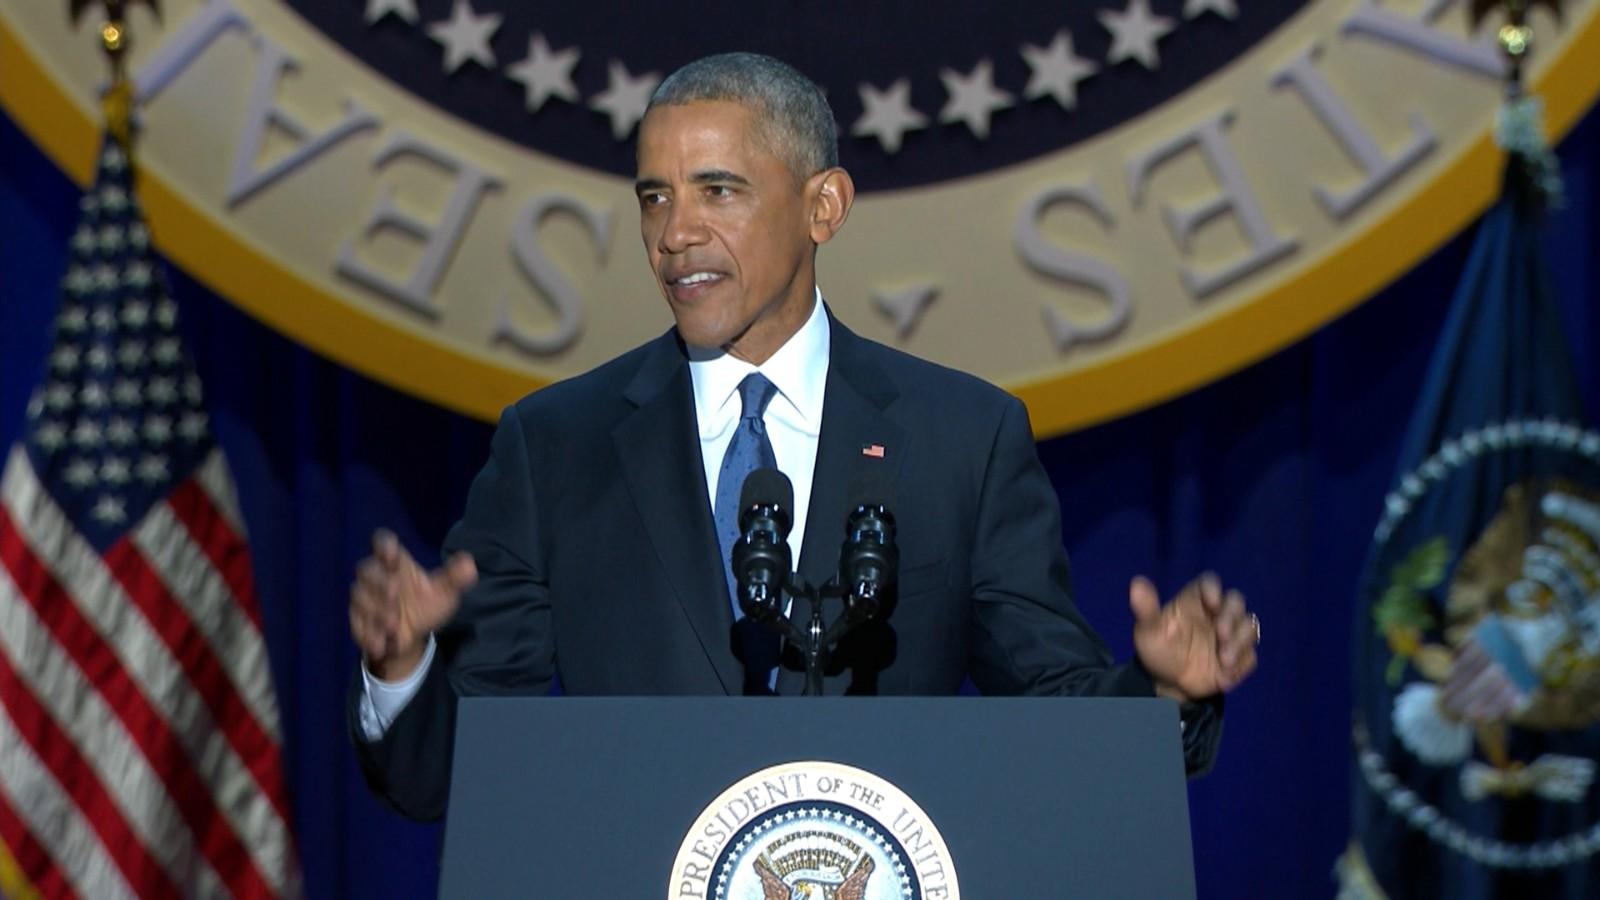 President Obama farewell address: full text, video - CNNPolitics